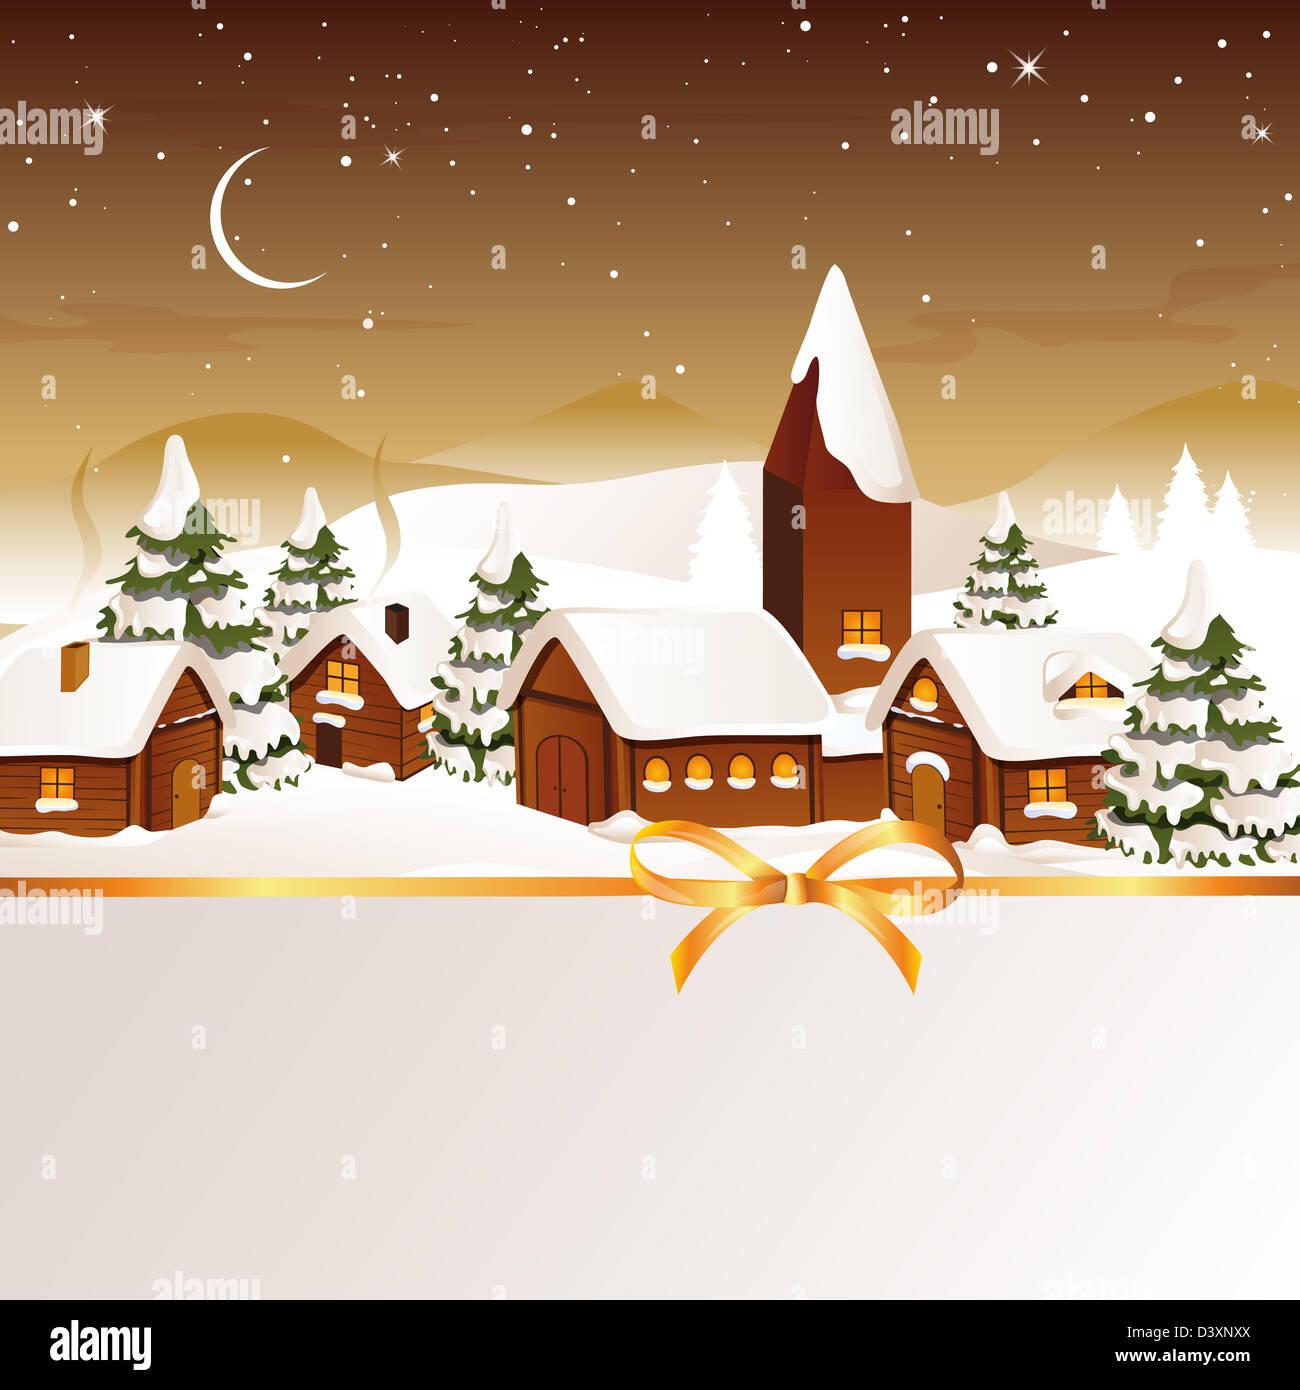 Winter scene - christmas card Stock Photo: 54063042 - Alamy